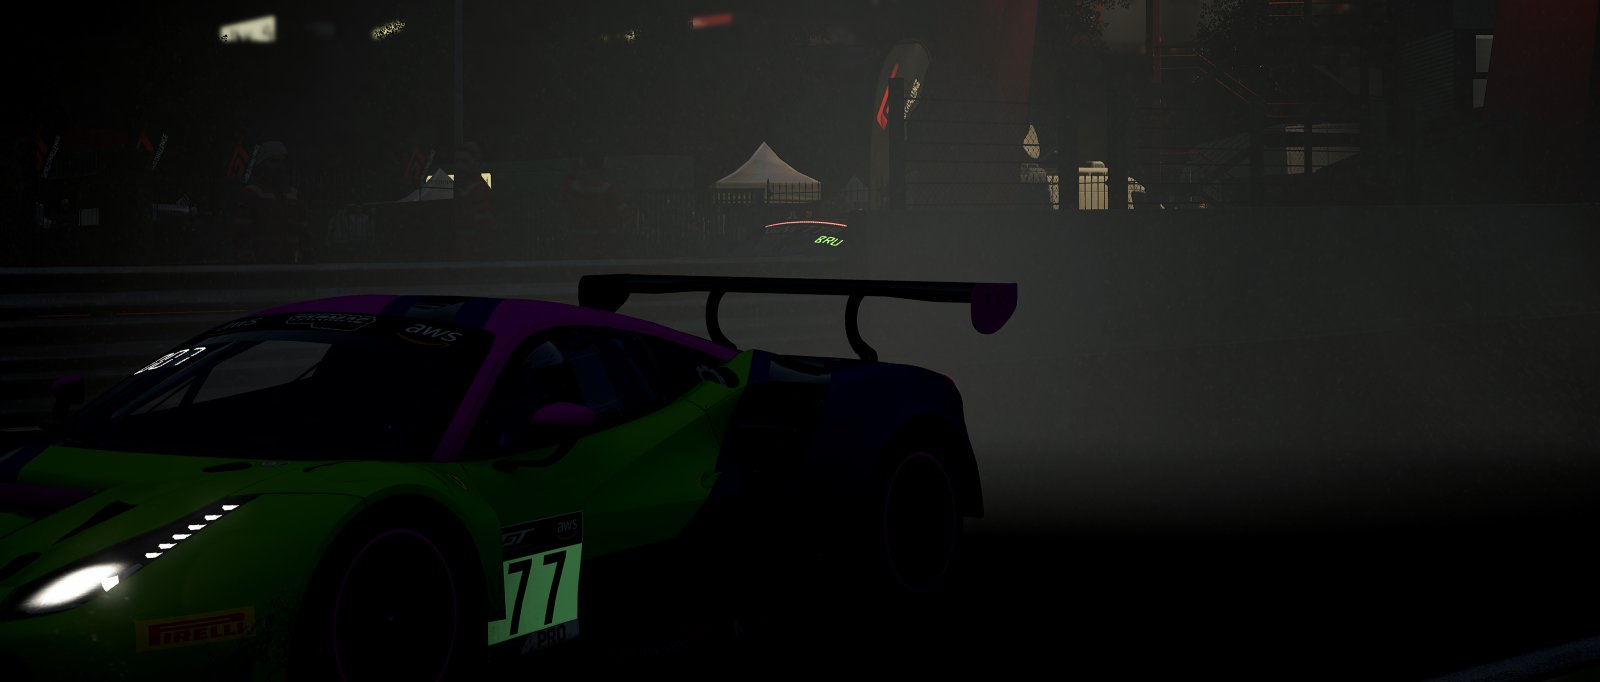 Assetto Corsa Competizione Screenshot 2020.11.14 - 19.53.08.90.jpg